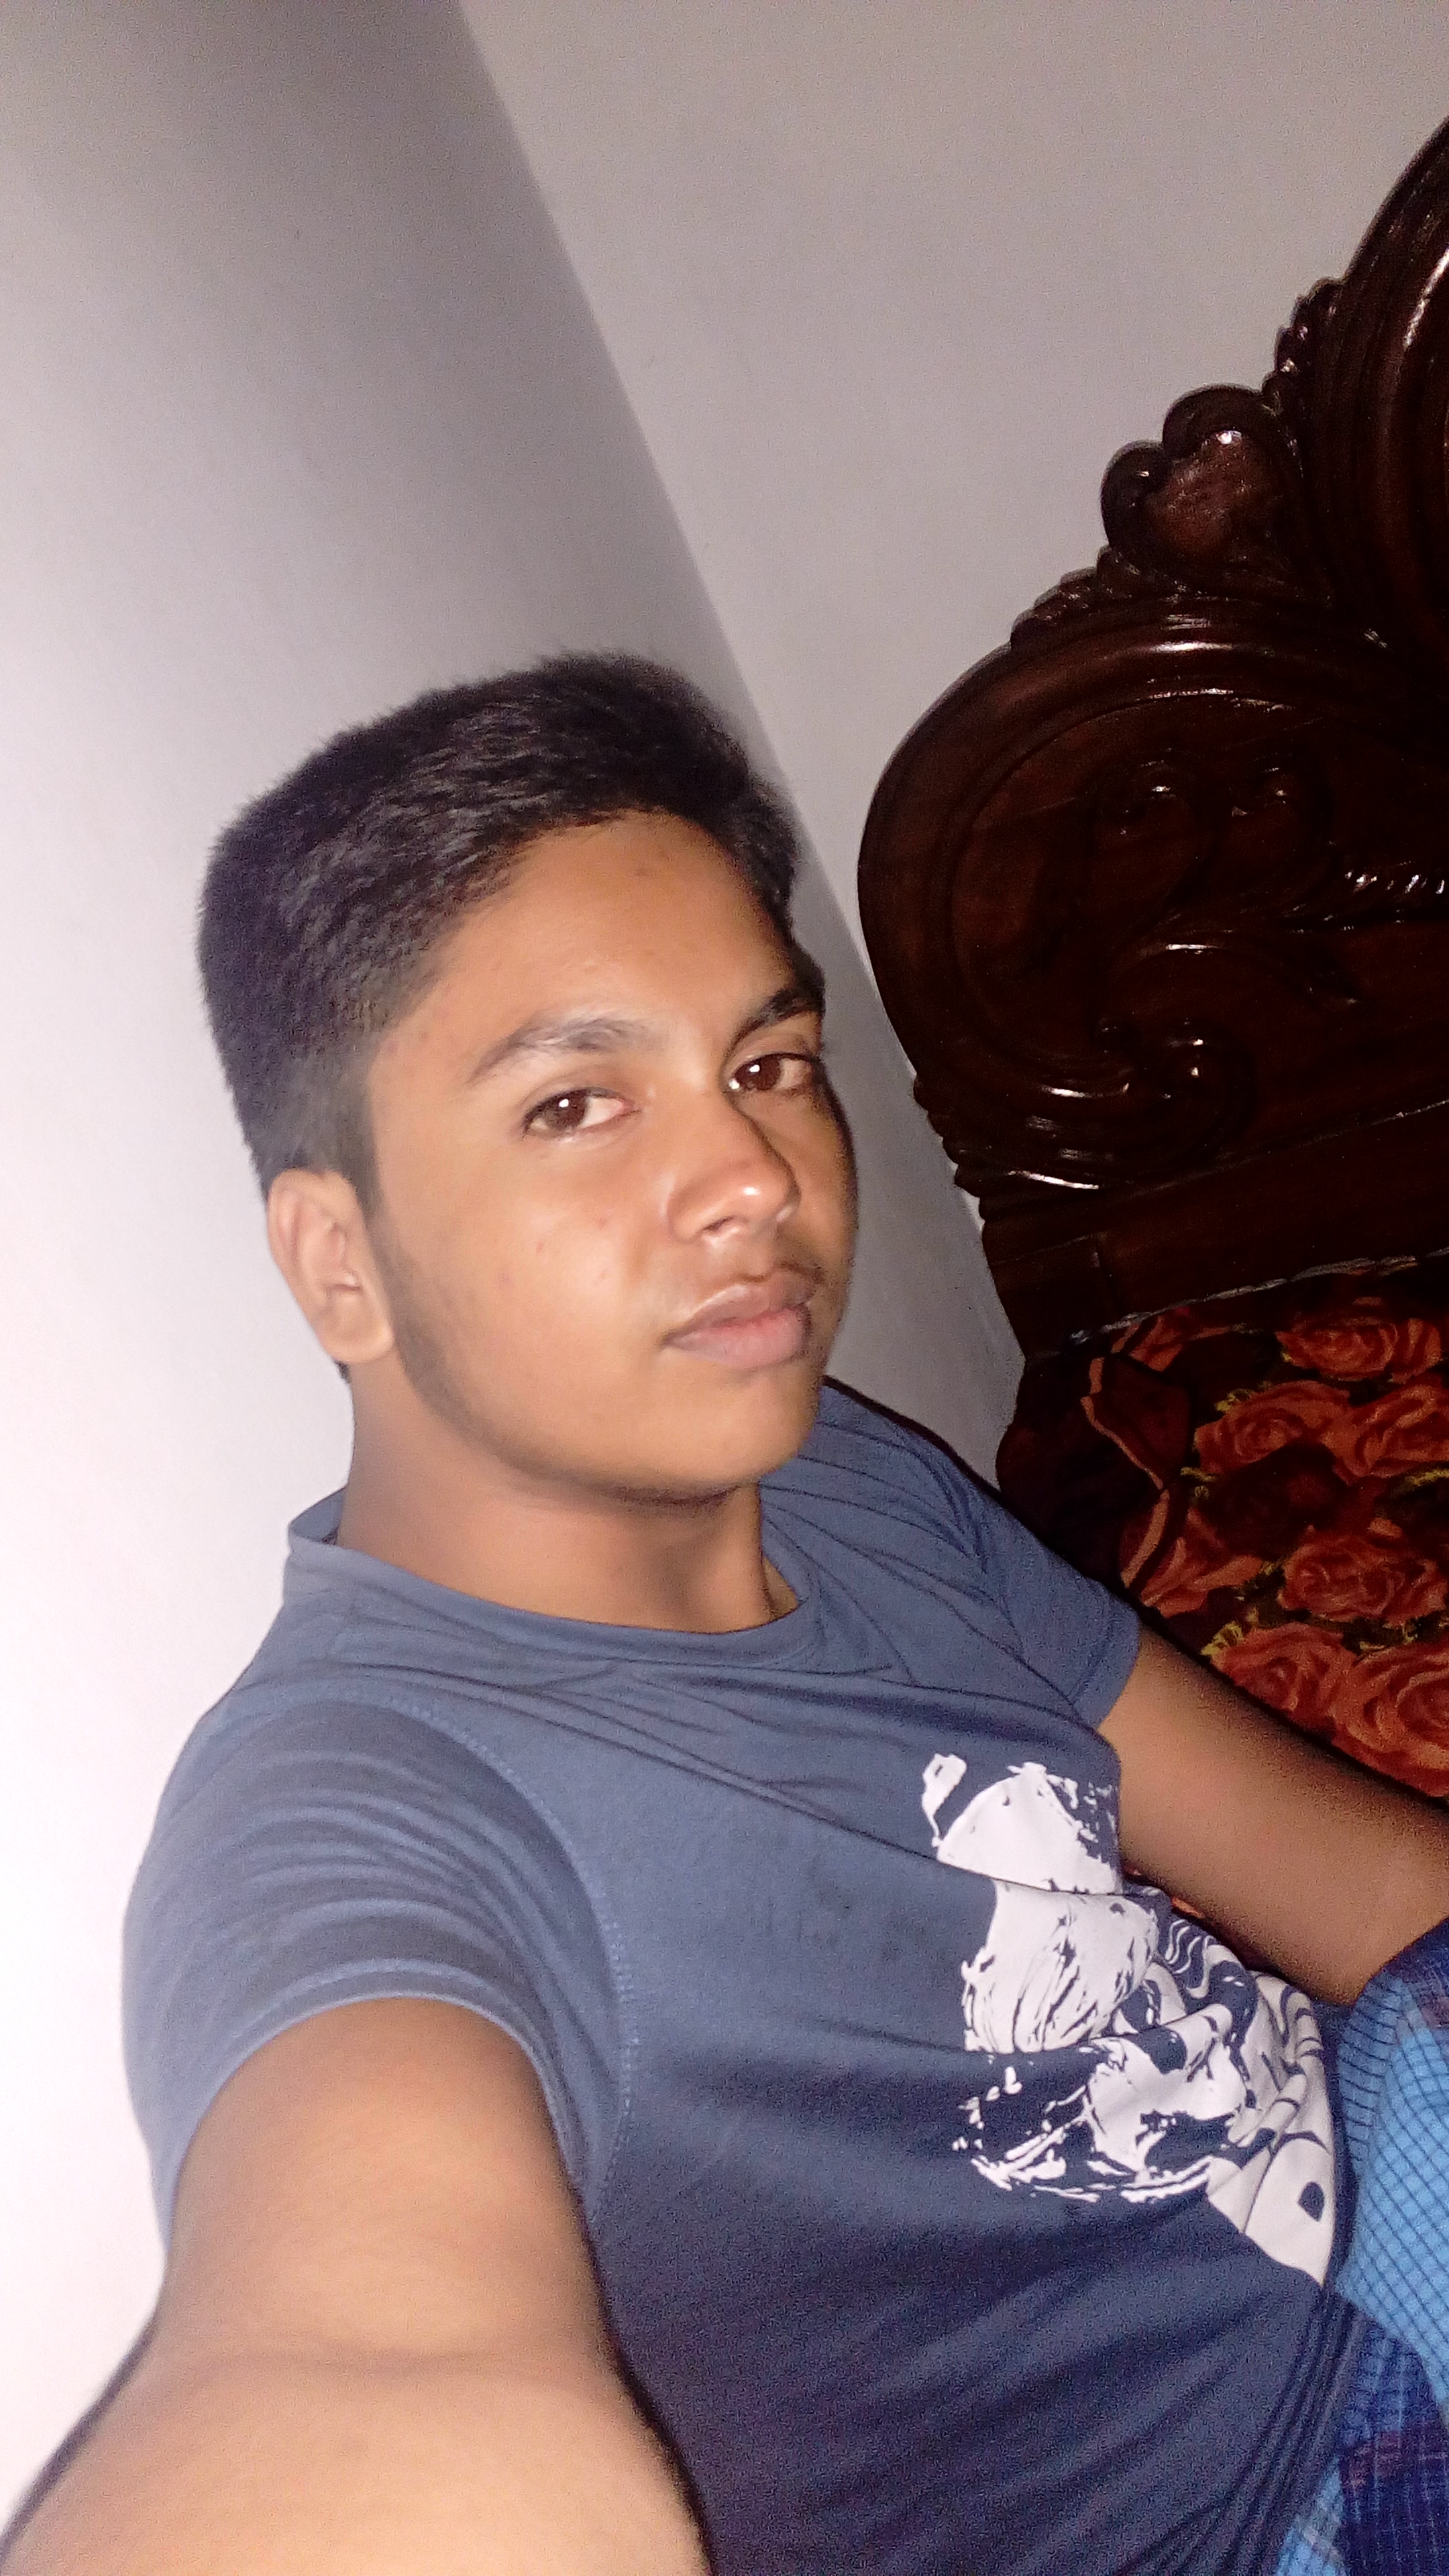 Prince Tuhin